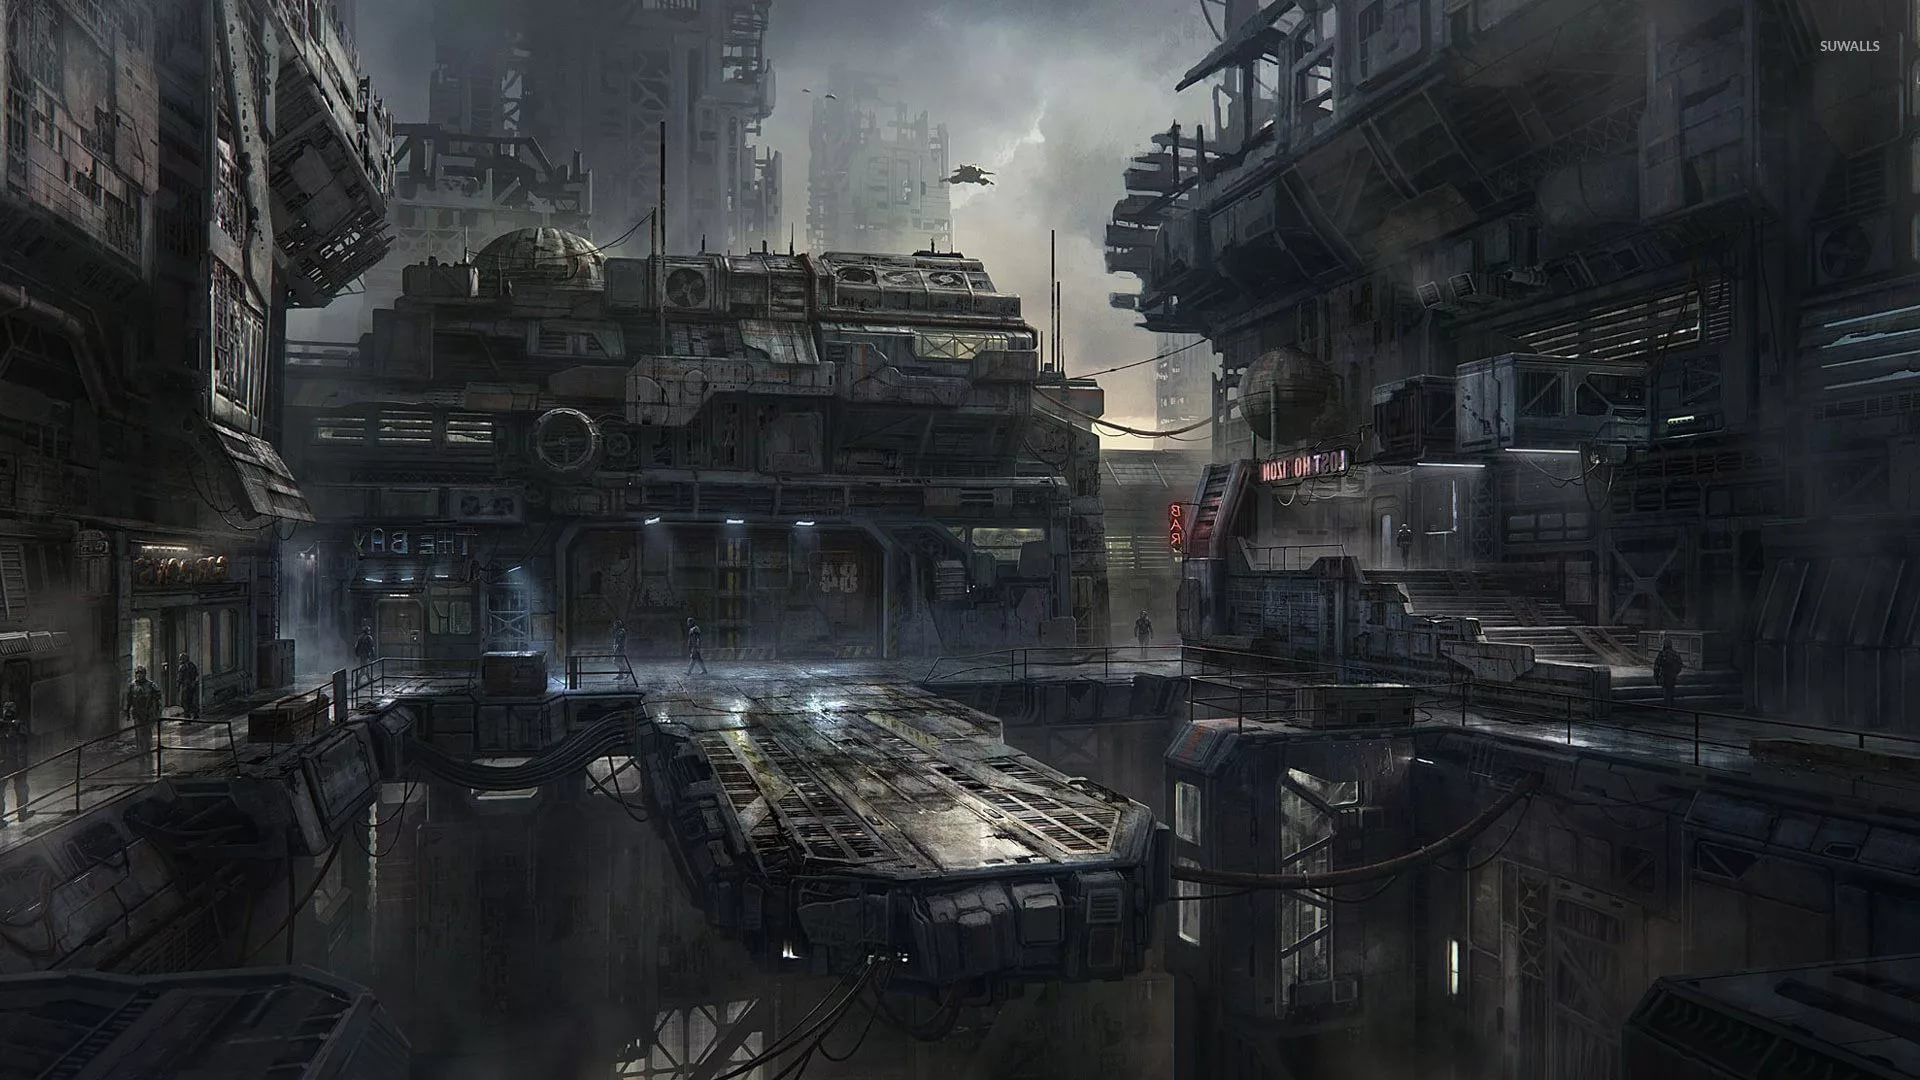 Future download wallpaper image